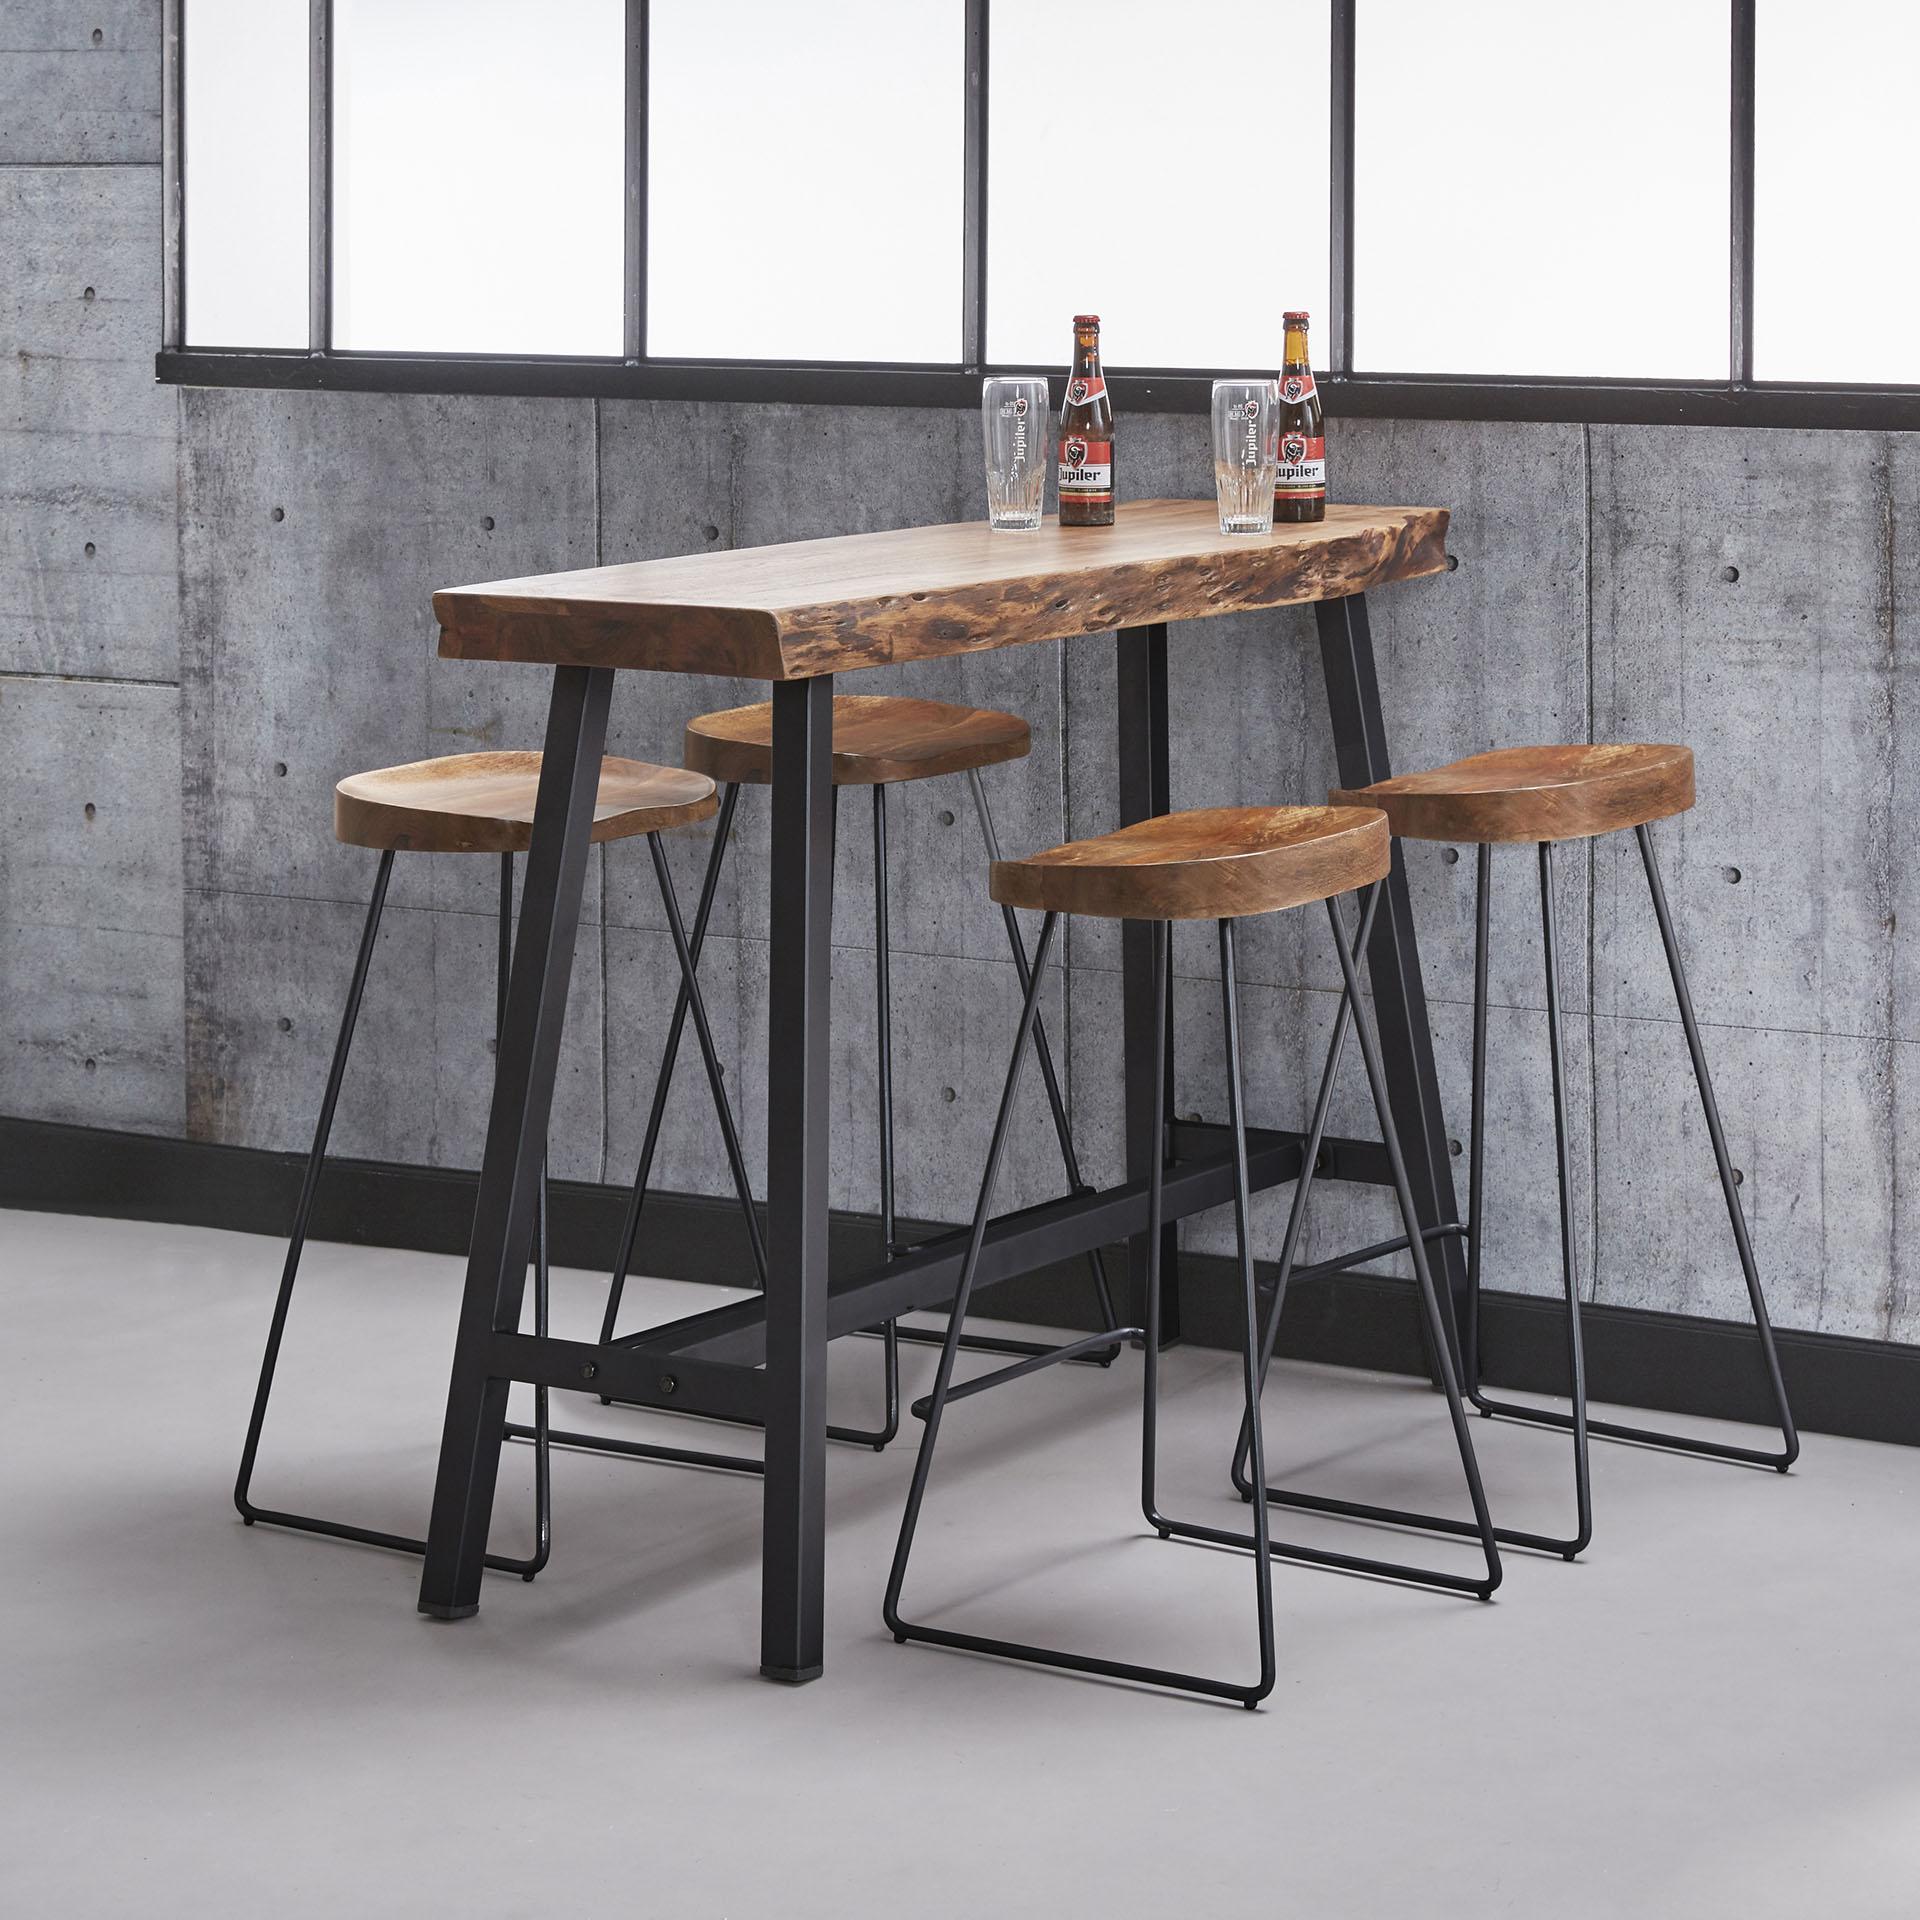 Table Bar Bois D Acacia Massif Metal 125 Cm Melbourne Tables